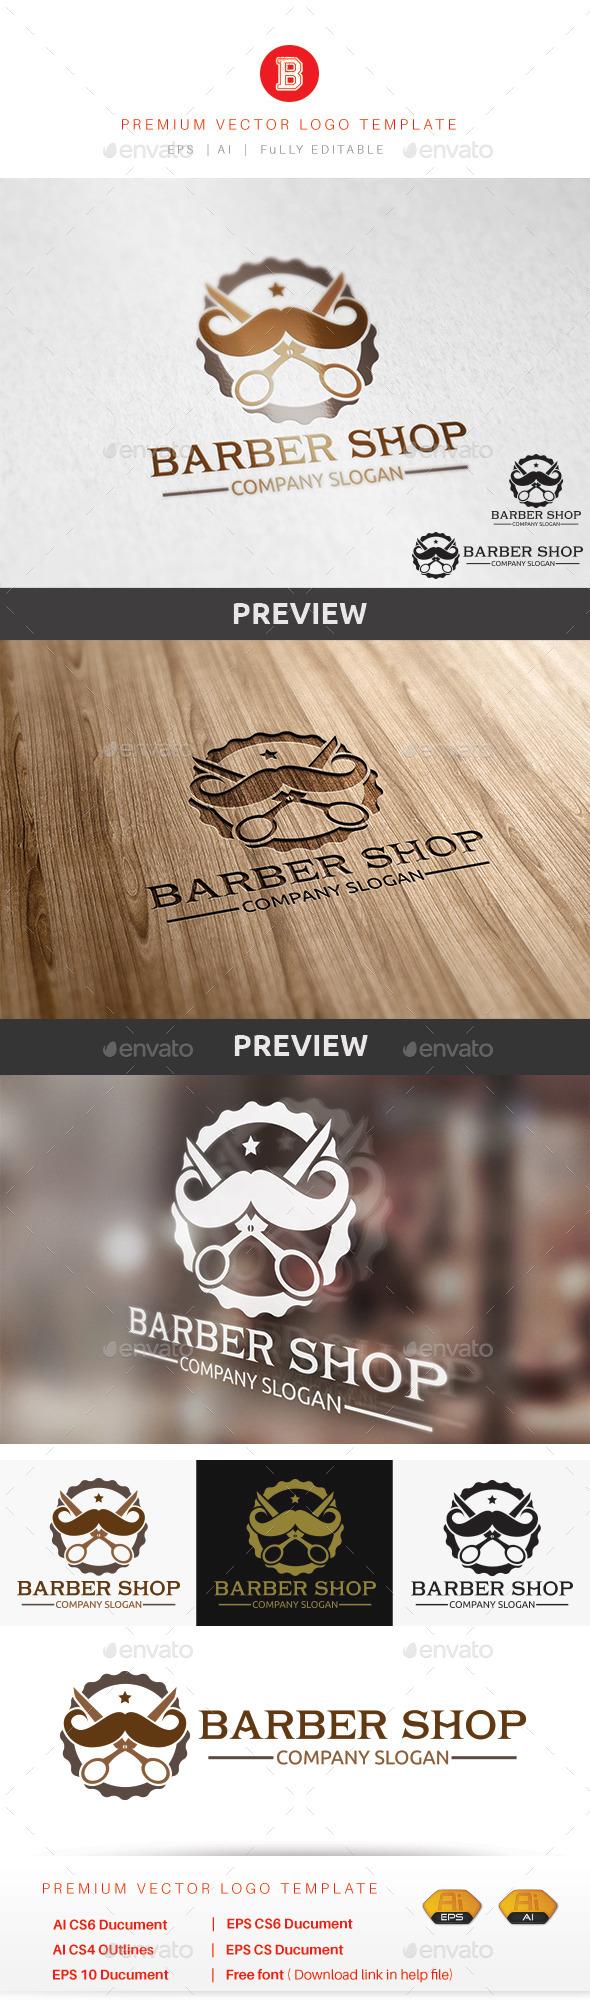 GraphicRiver Barber Shop 9454058